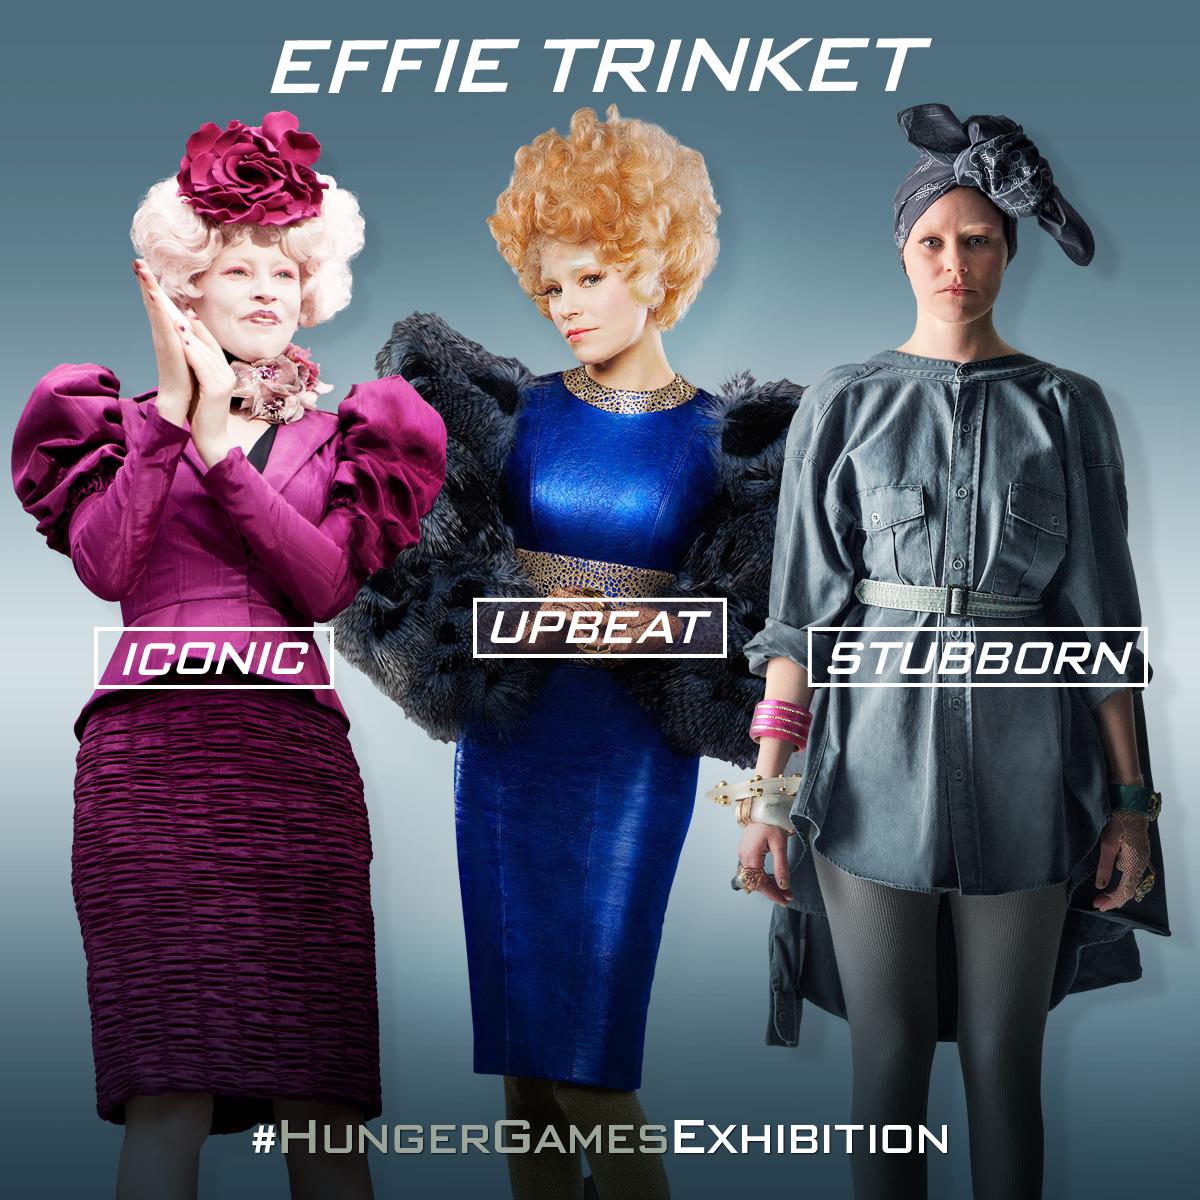 Discover Effie's fashion evolution at The #HungerGamesExhibition.